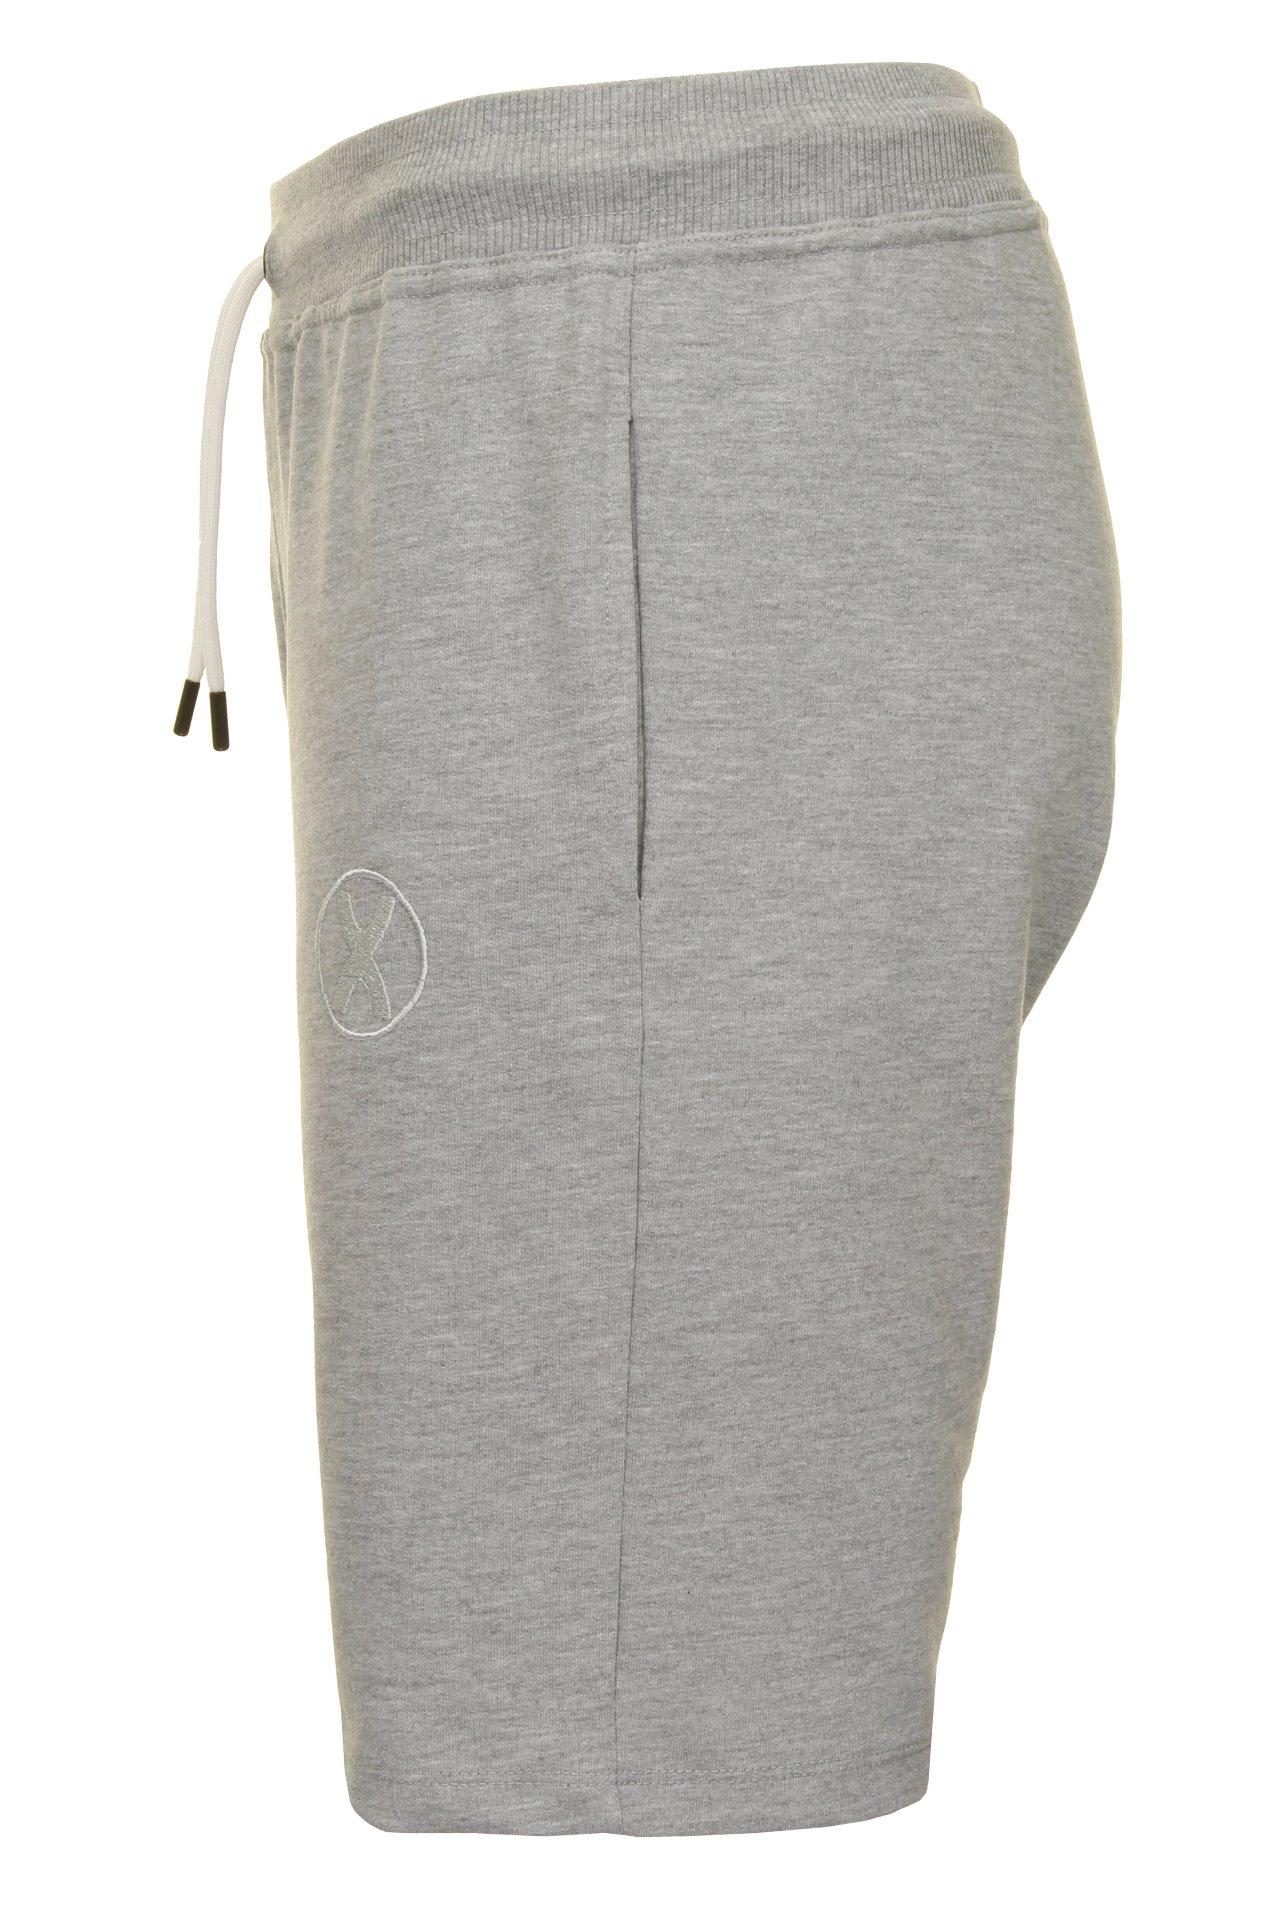 Xact Men/'s Cotton Gym// Sweat Jogger Shorts